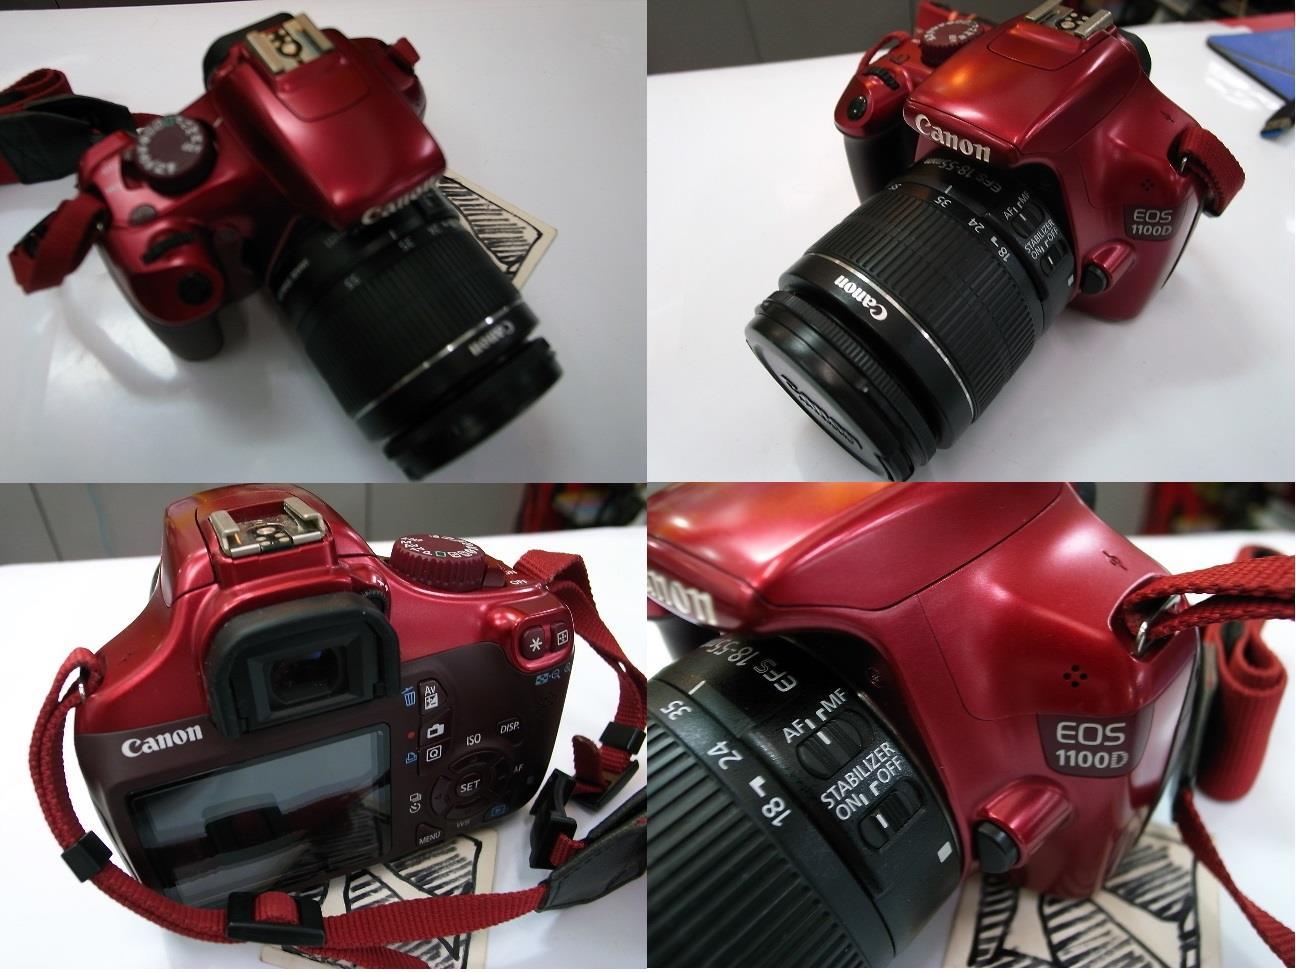 Canon Eos 1100d 18 55mm Lens Digital End 10 5 2016 715 Pm Camera Dslr Rm950